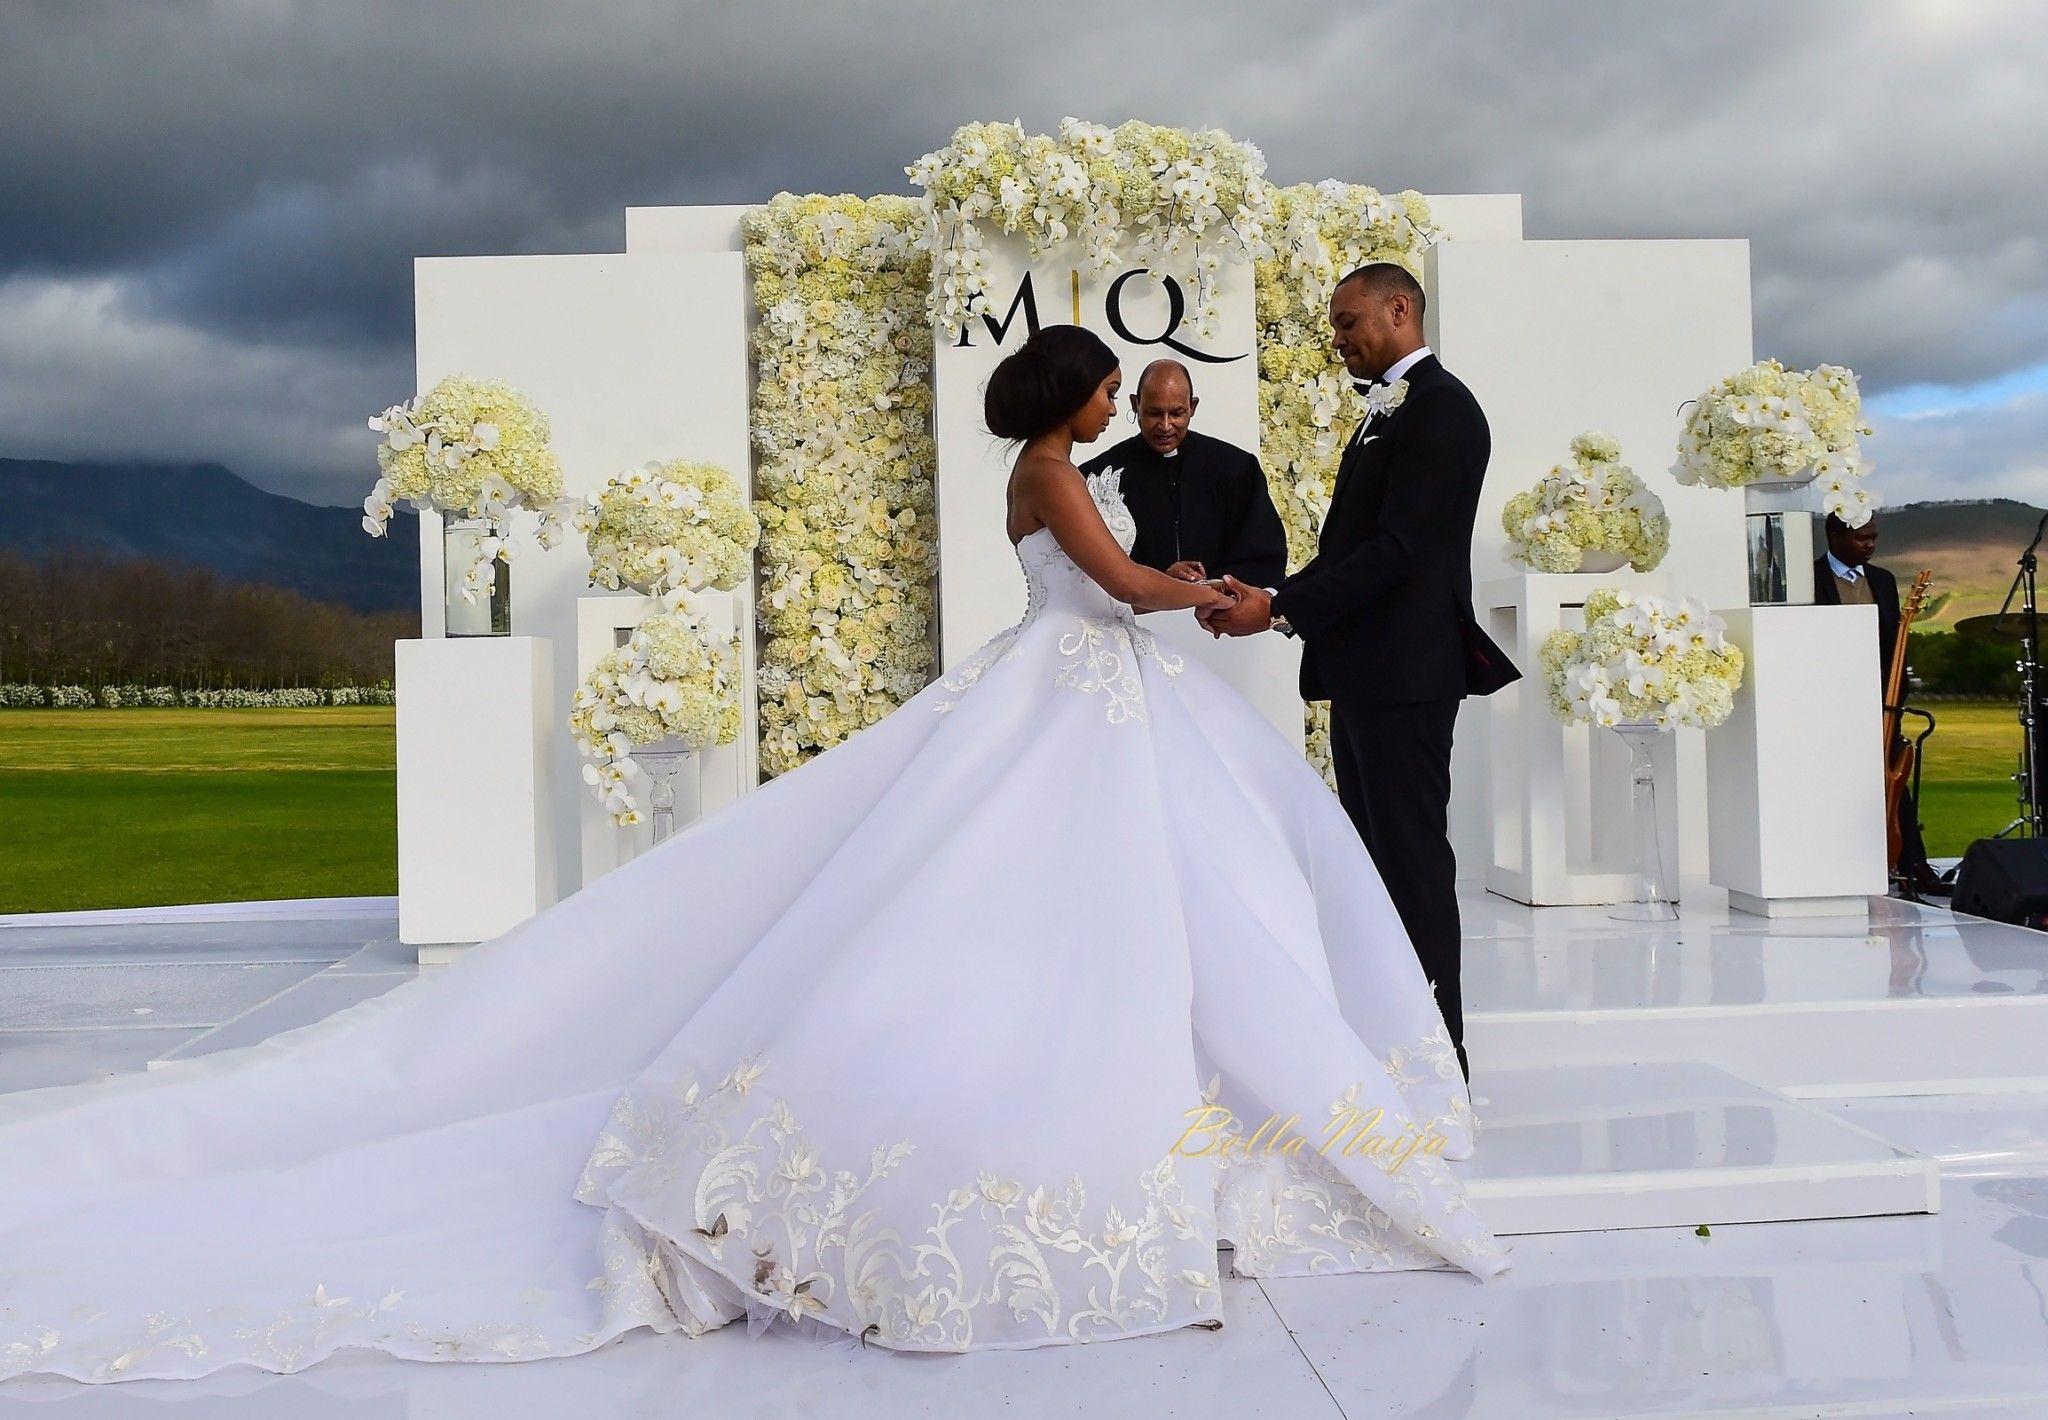 The beautiful Minnie Dlamini married her sweetheart Quinton Jones recently. Their wedding ceremony planned…   Church wedding dress, Fairytale wedding, Wedding looks